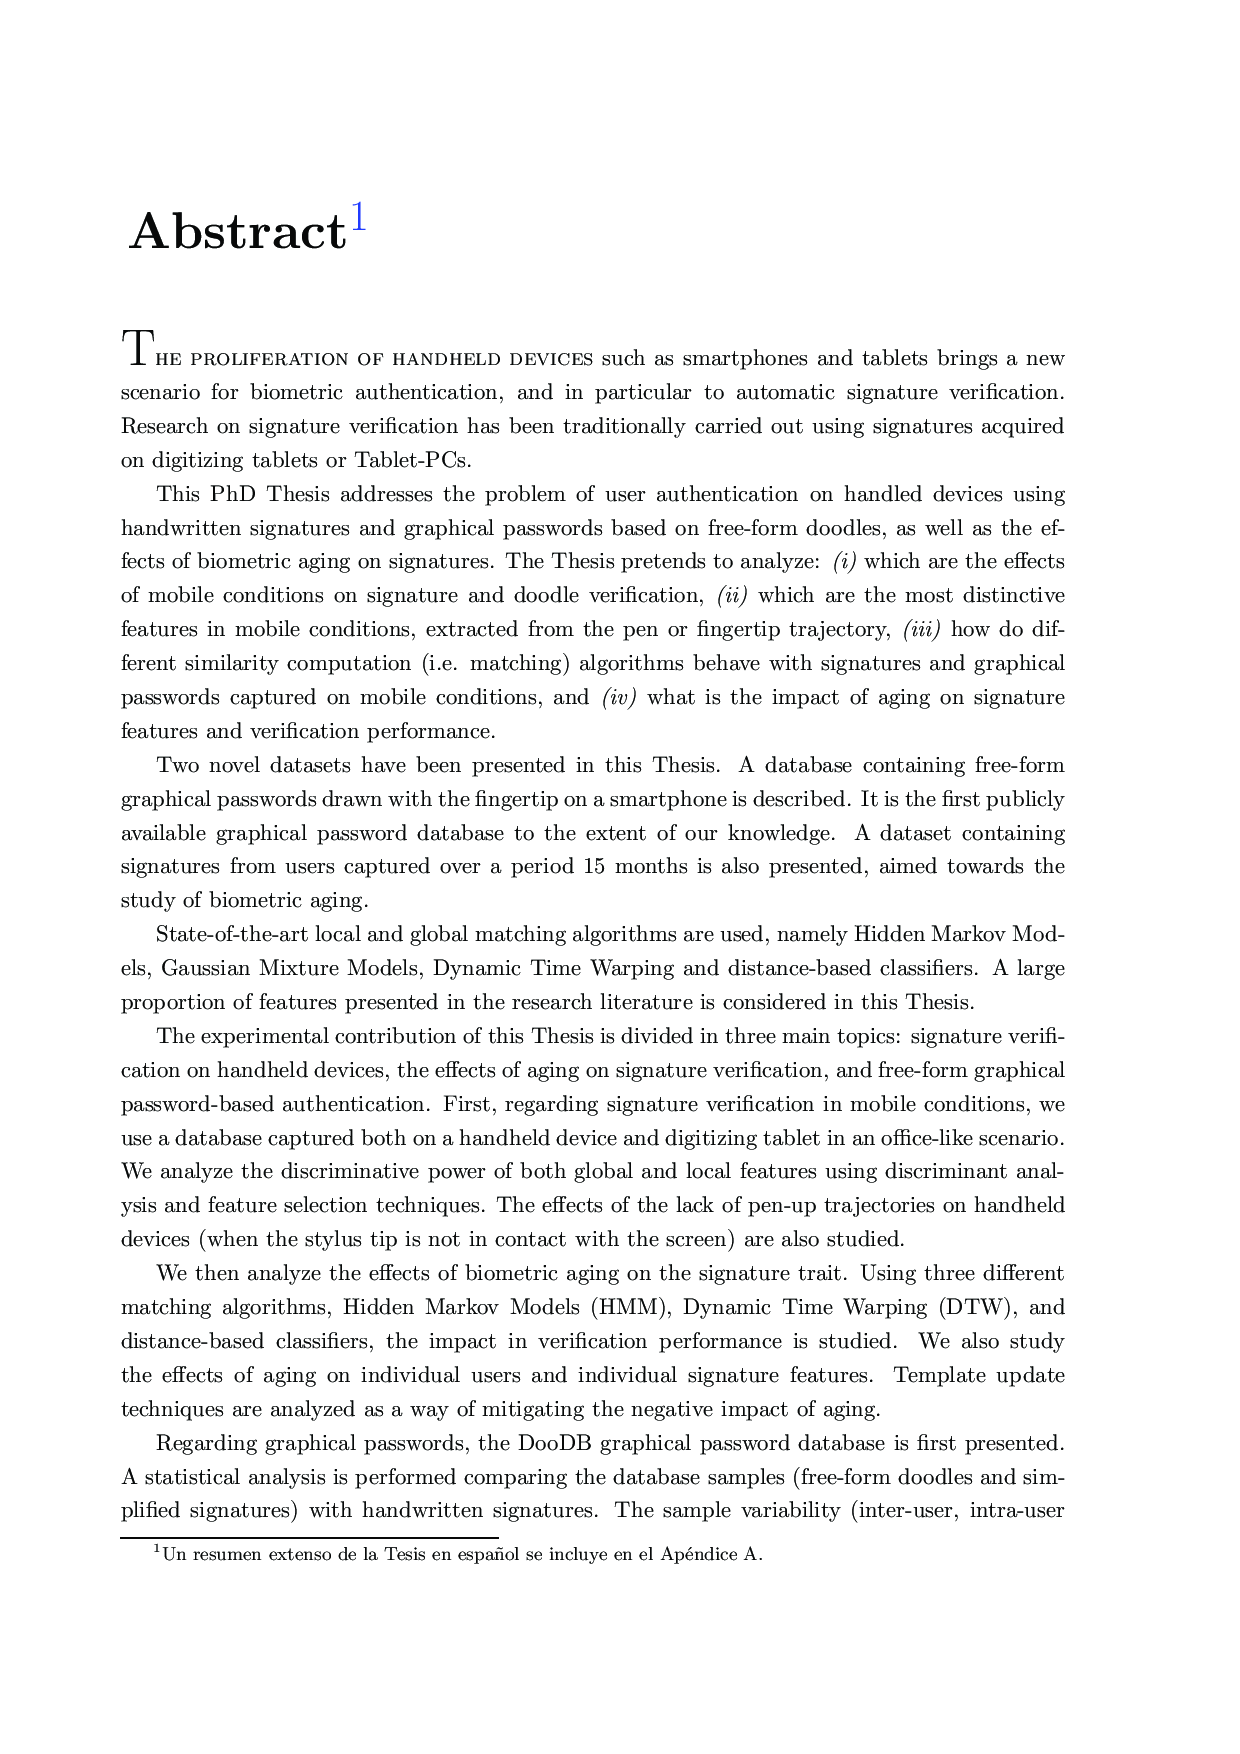 Eurasip phd thesis